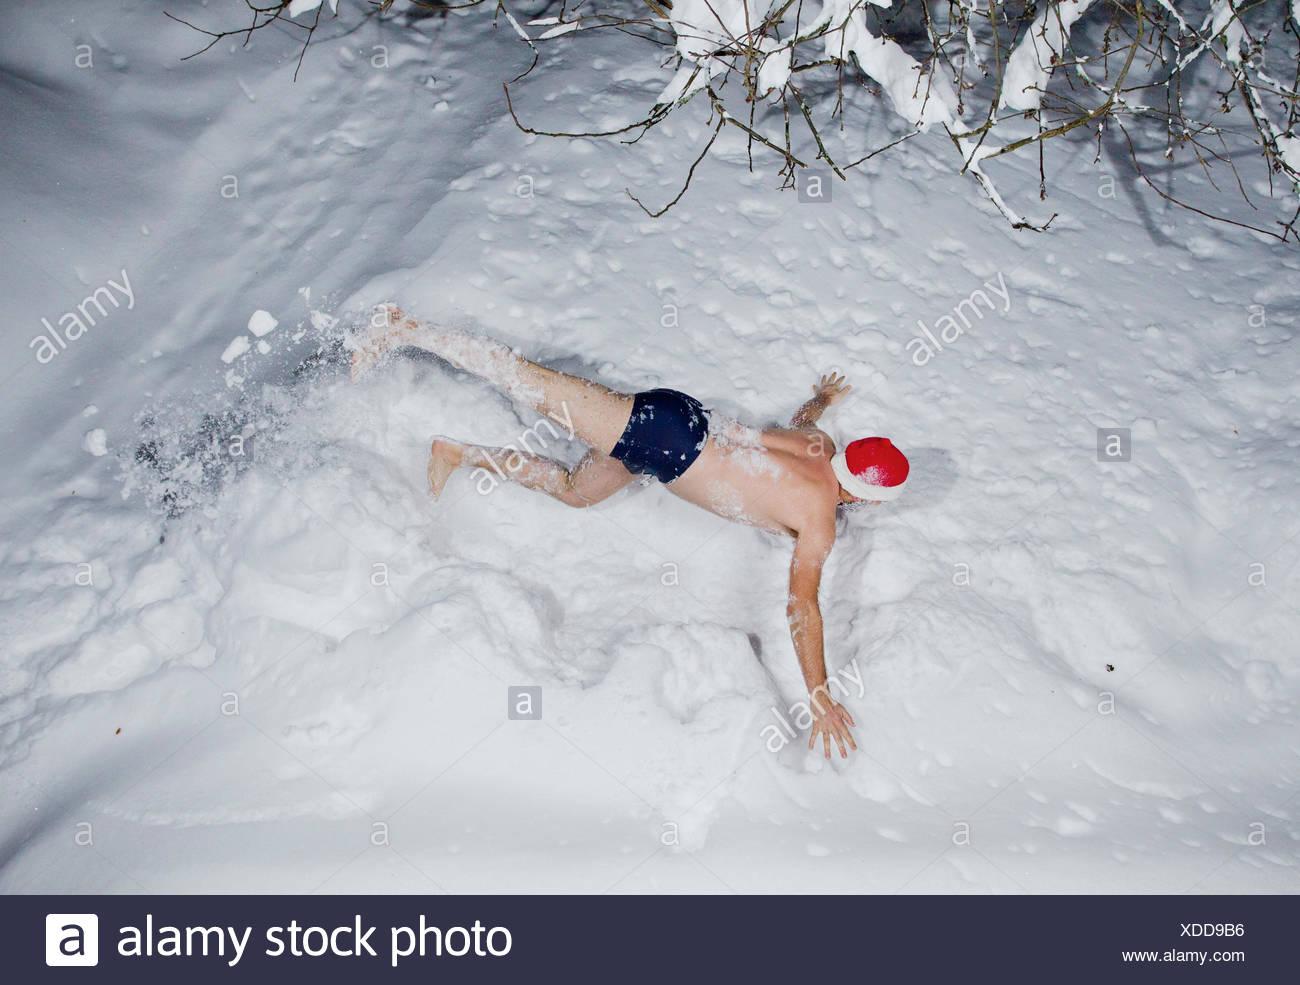 Finland, Heinola, Man lying down on snow undressed - Stock Image